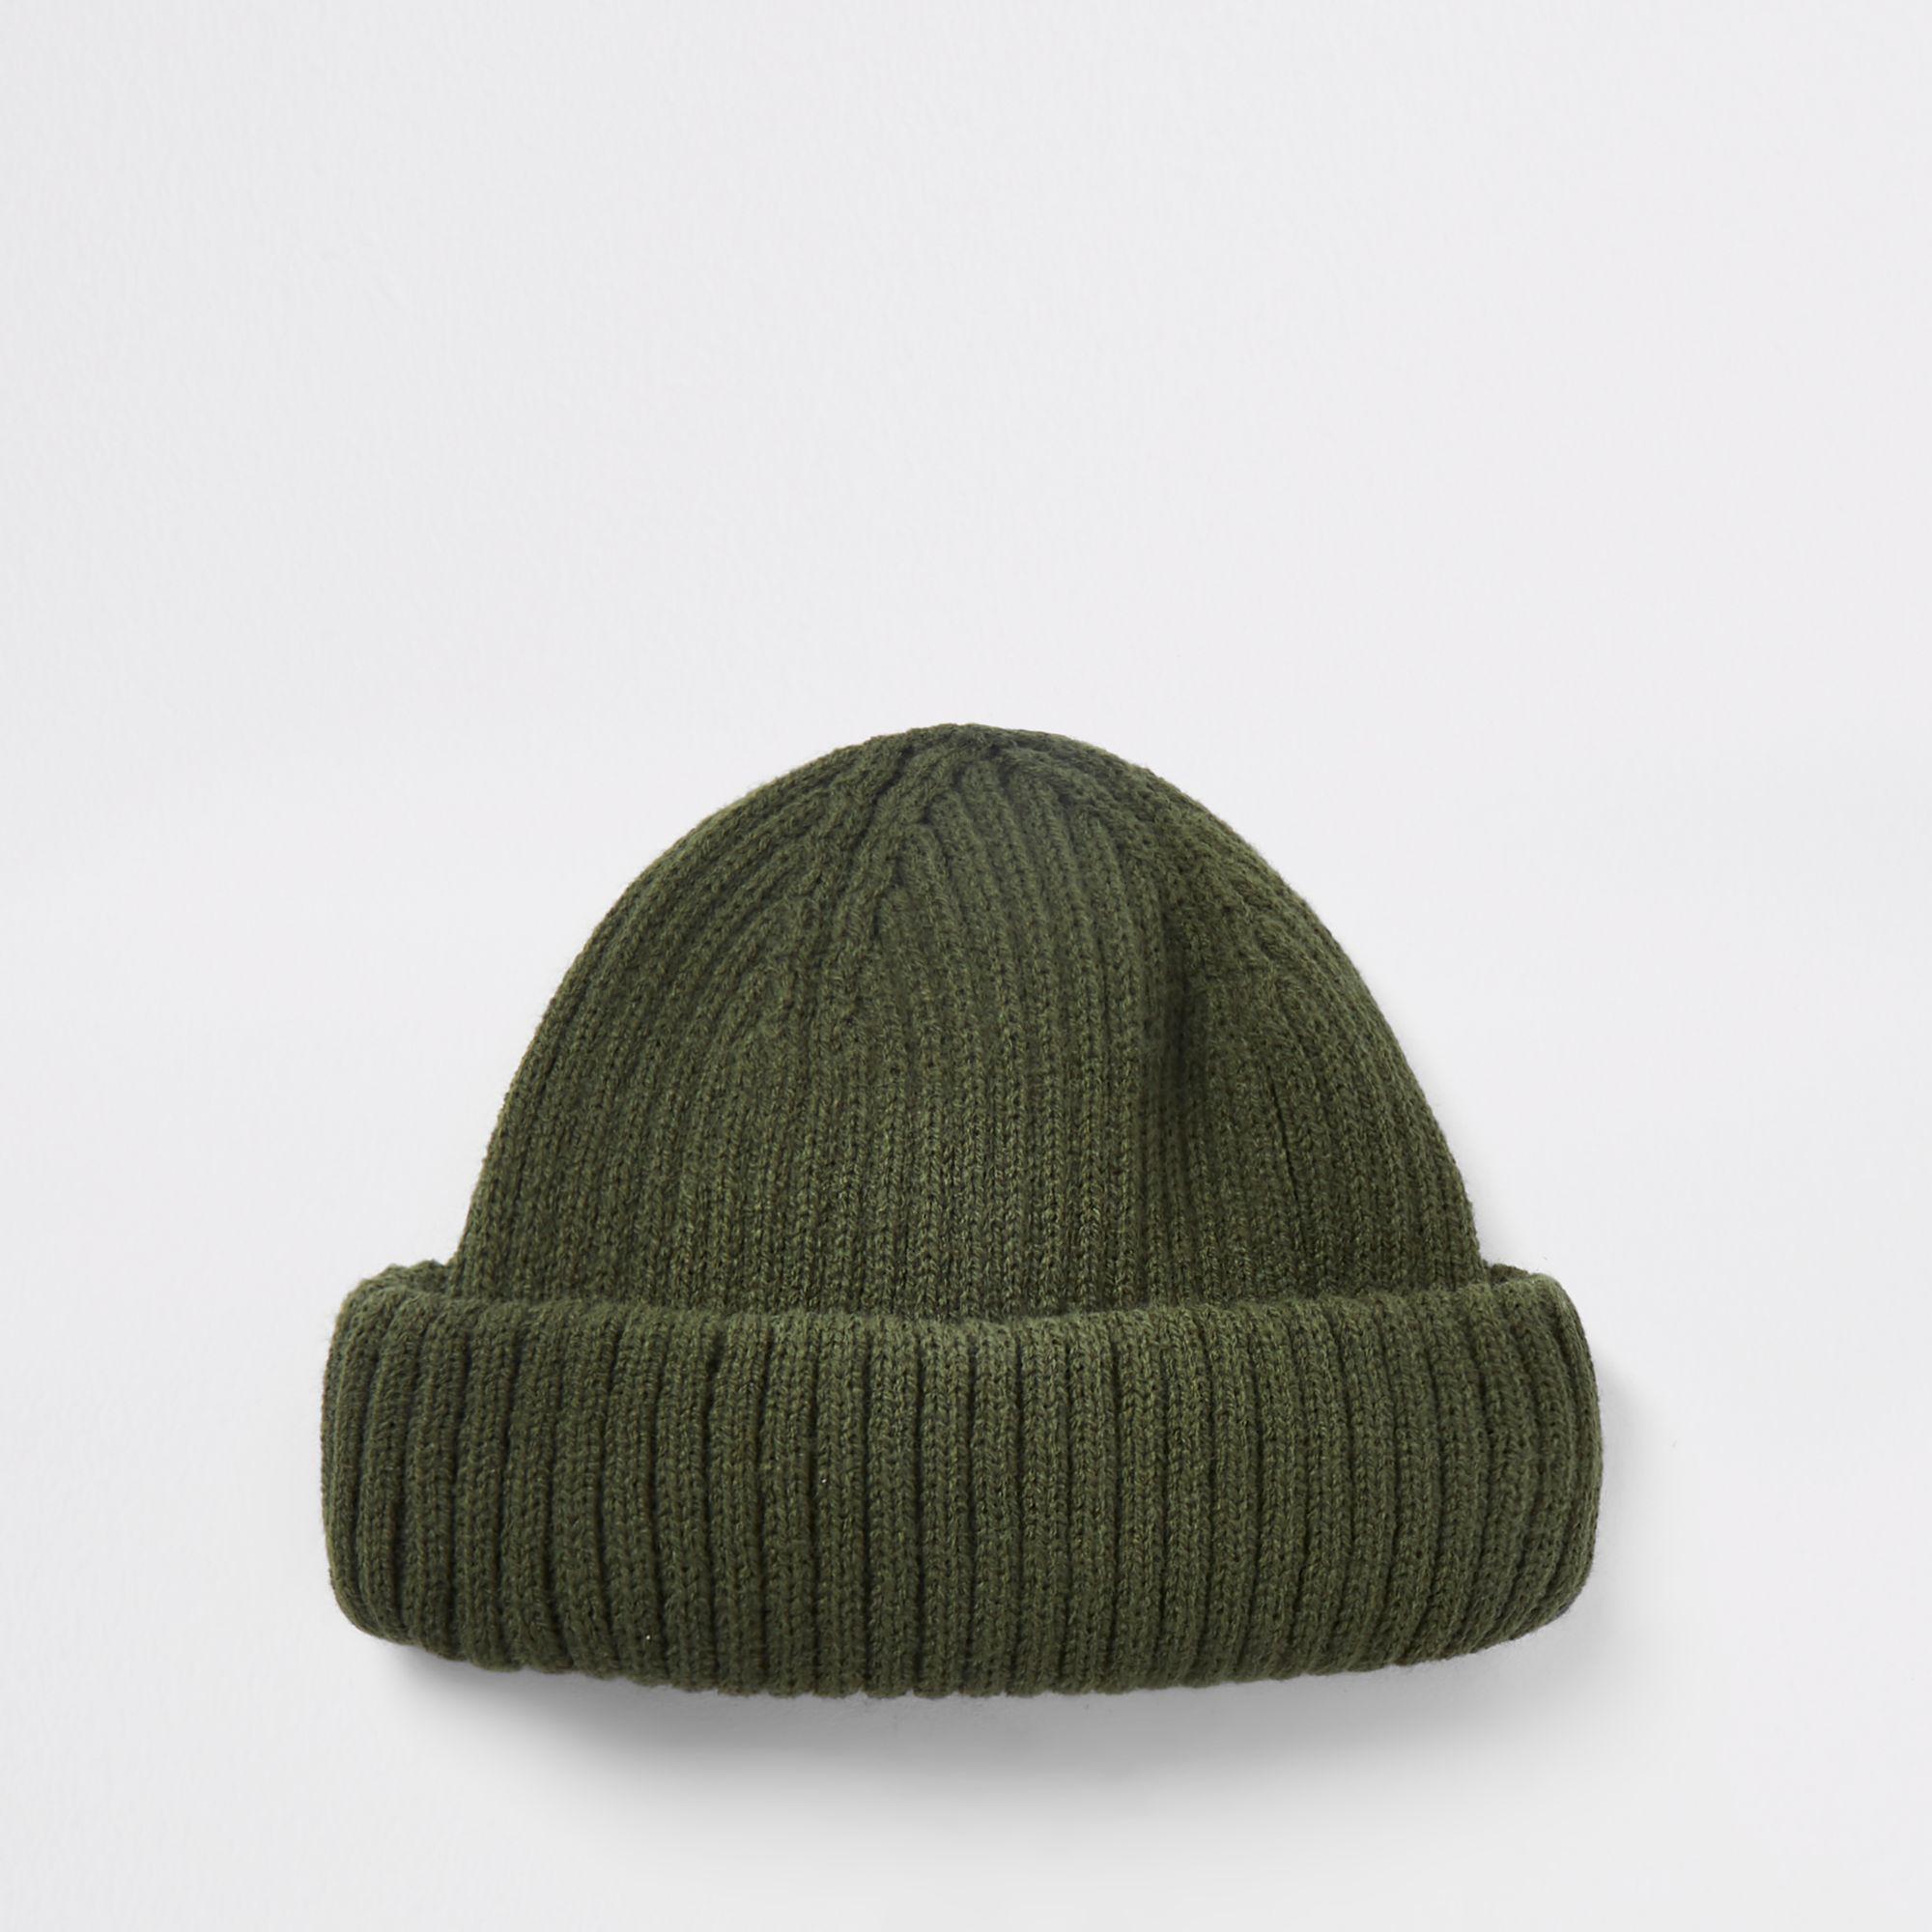 1a848c8daa0 Lyst - River Island Khaki Green Mini Fisherman Beanie Hat in Green ...